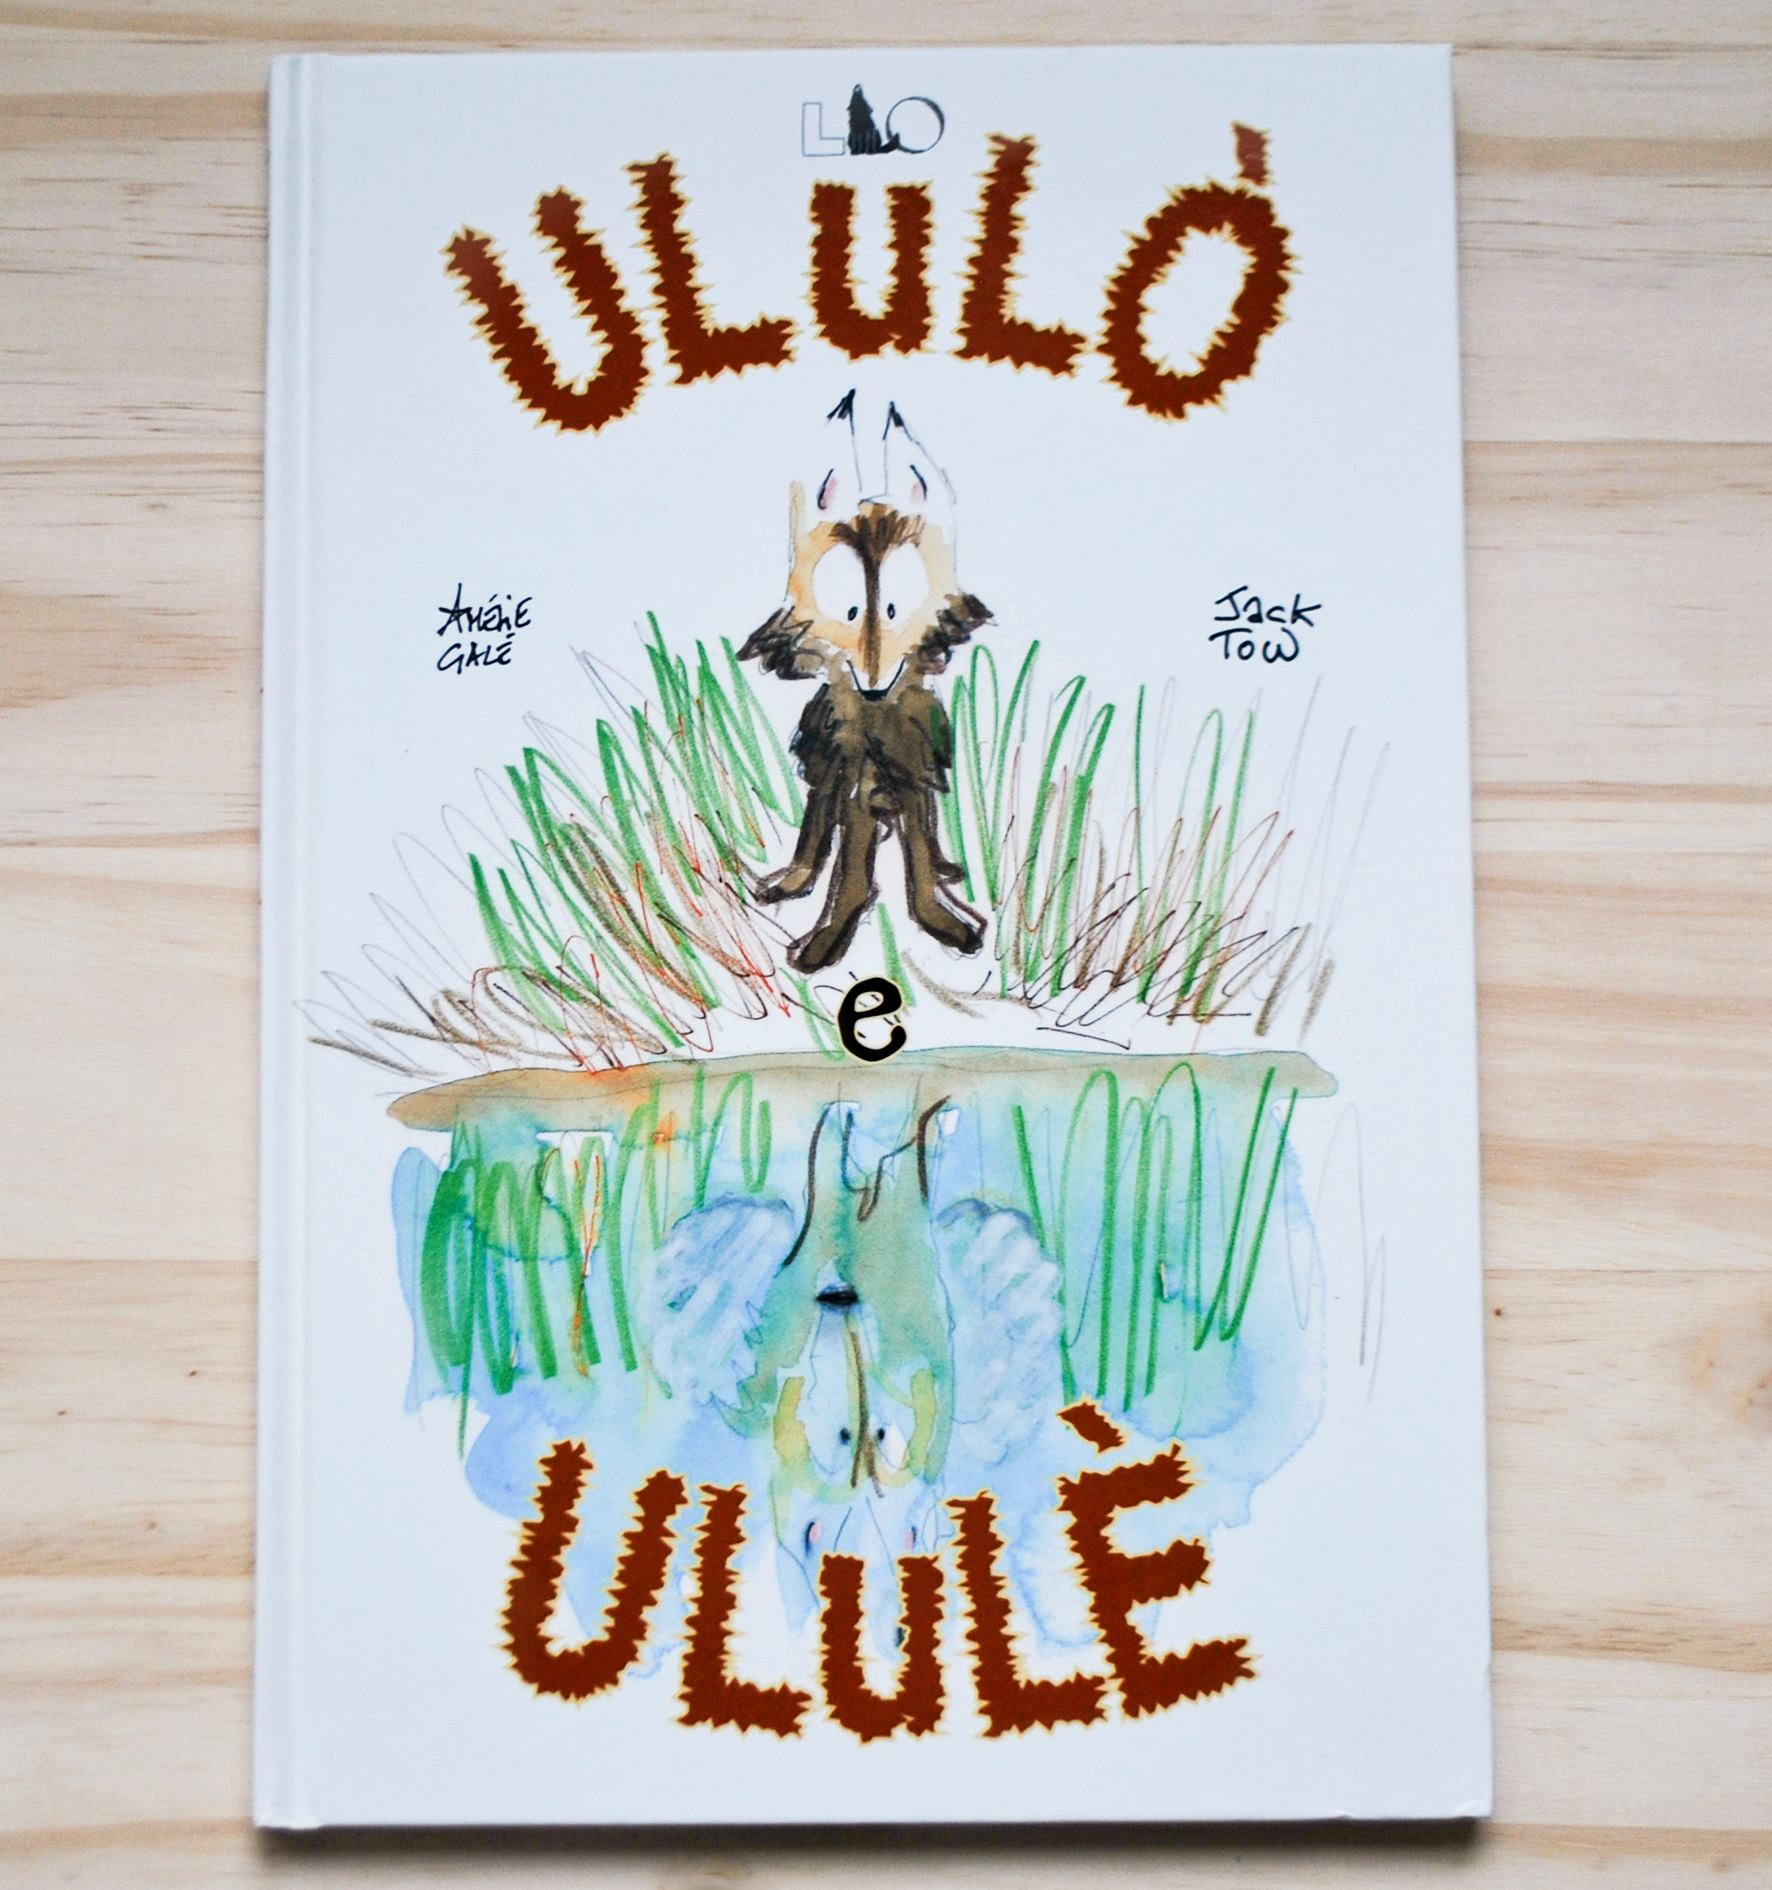 ULULÒ E ULULÈ di Amélie Galé e Jack Tow, LO editions